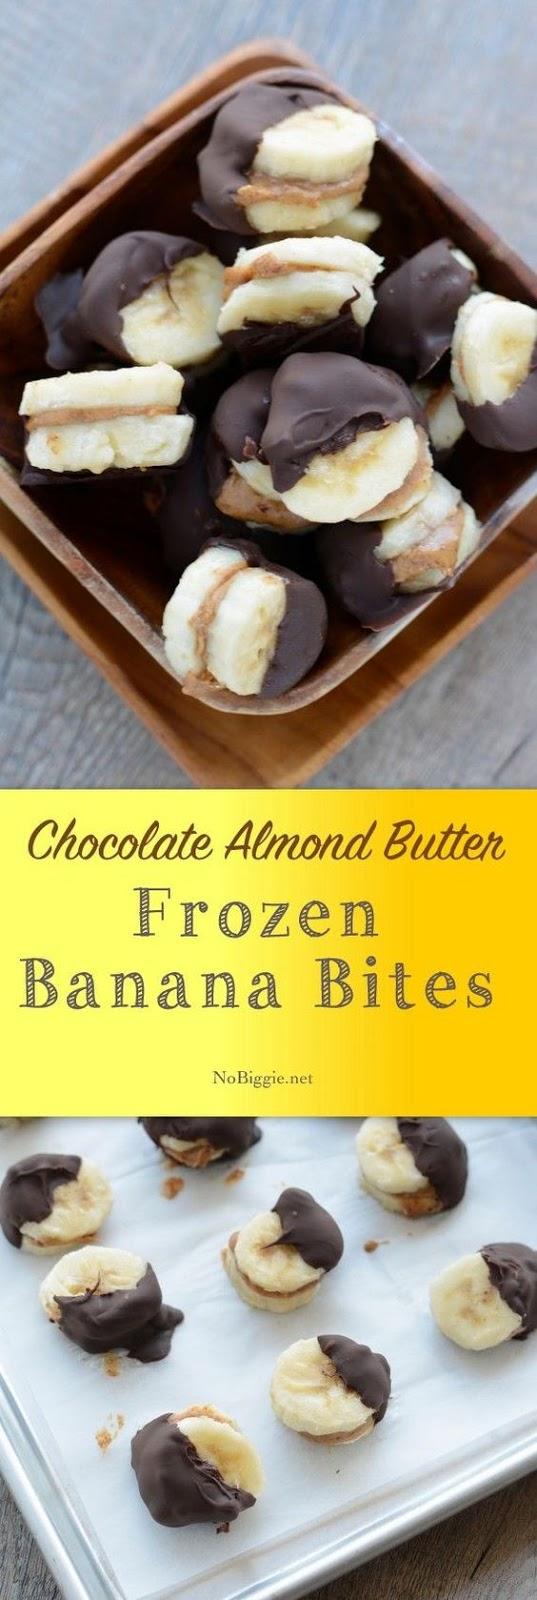 Frozen Banana Bites #frozen #banana #bites #healthysnack #healthysnackideas #healthyfood #healthyrecipes